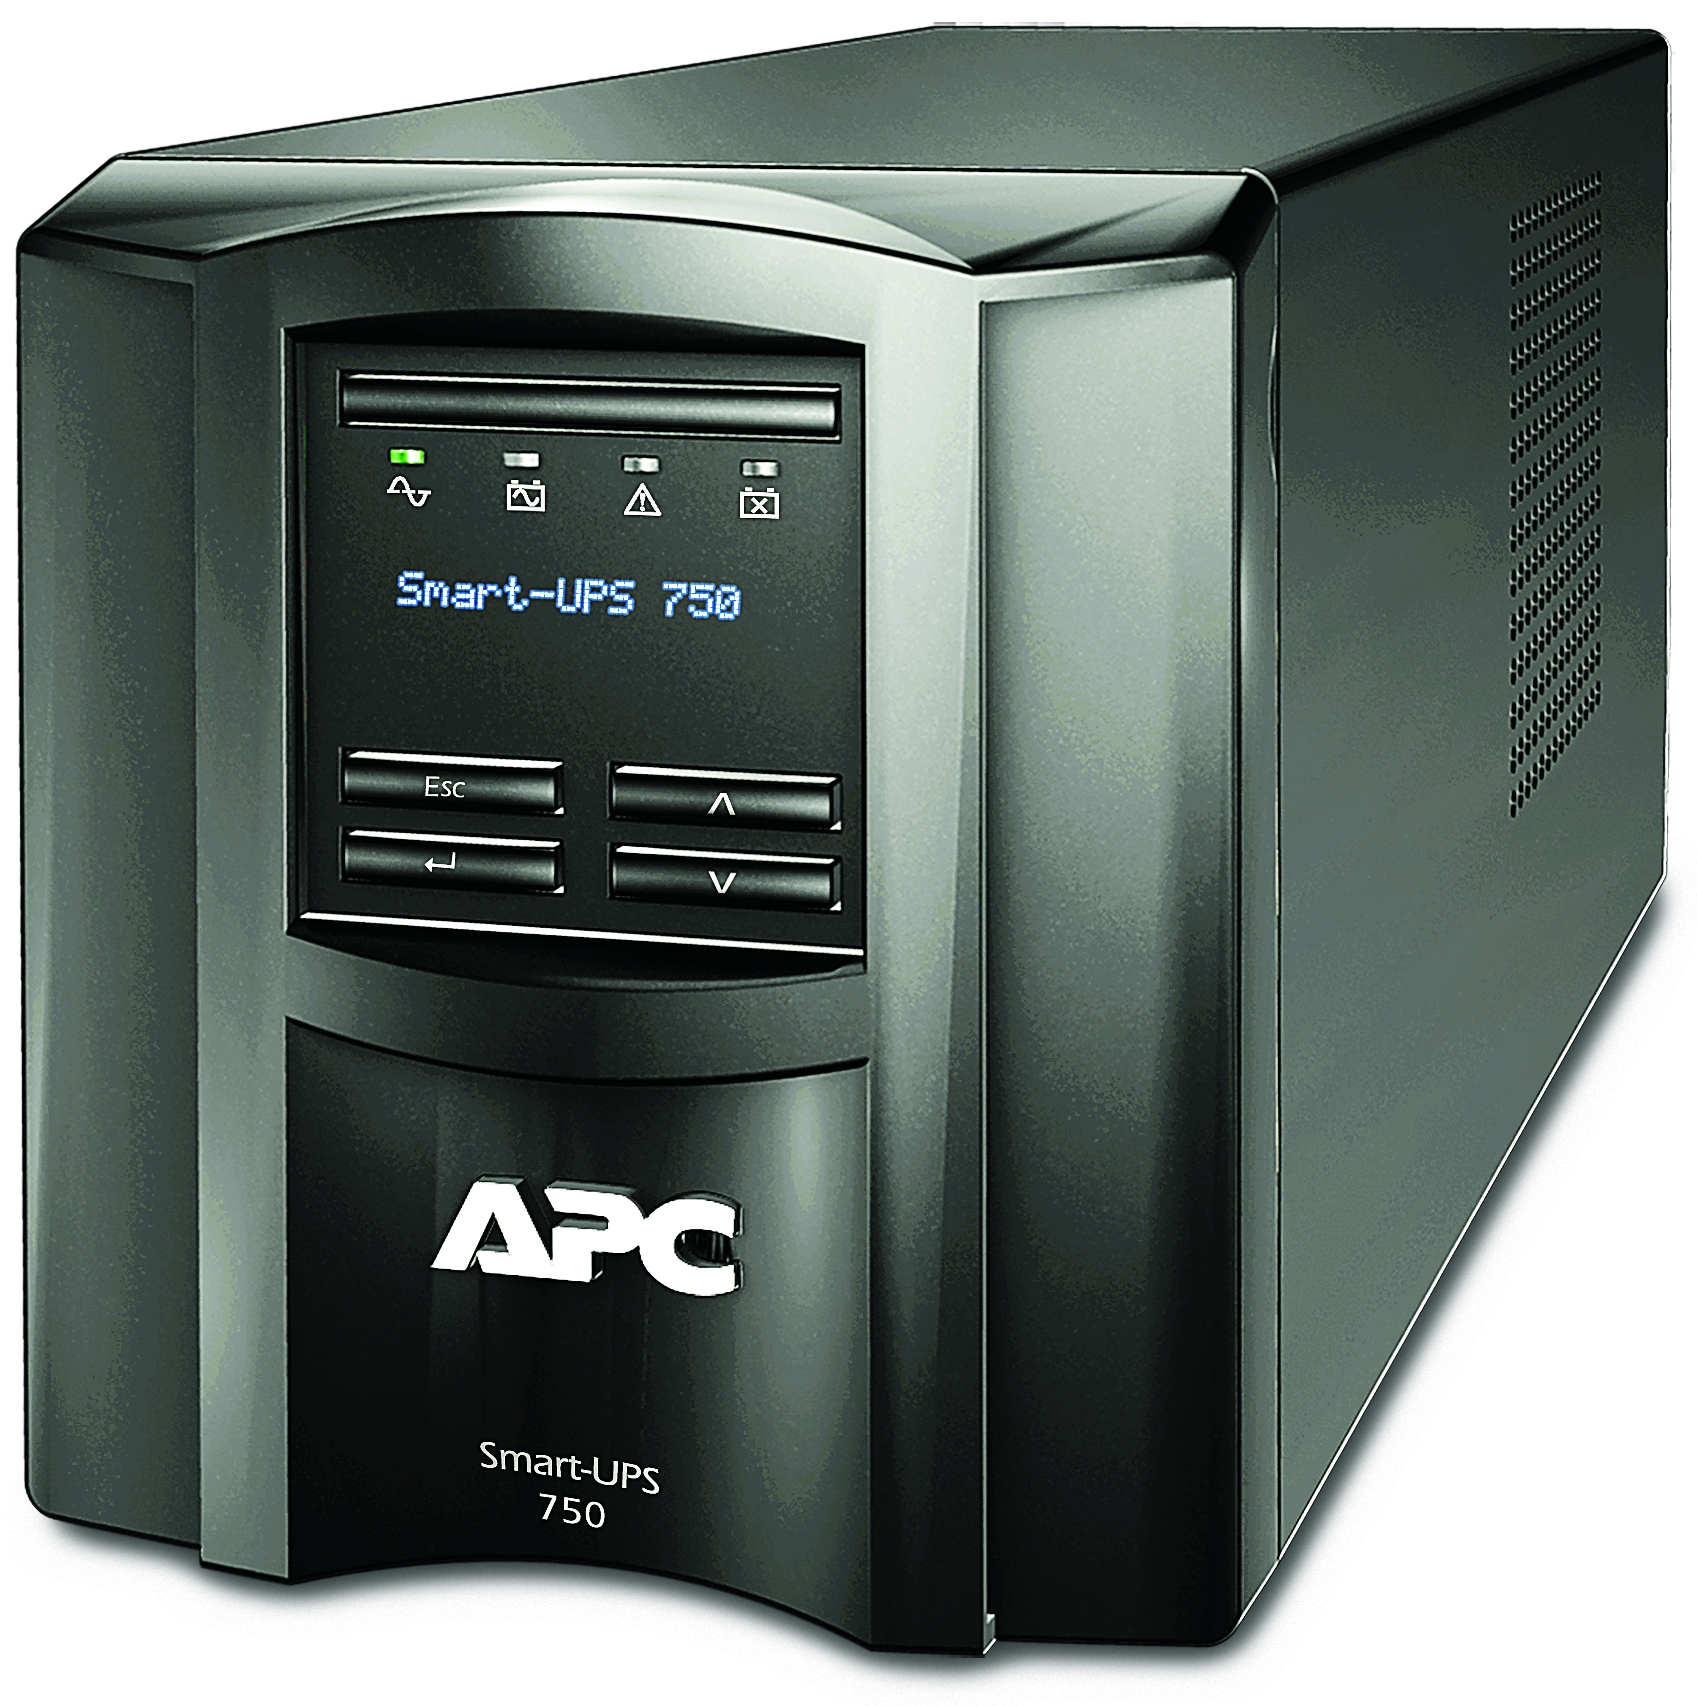 APC-by-Schneider-Electric-Smart-UPS-SMT750I